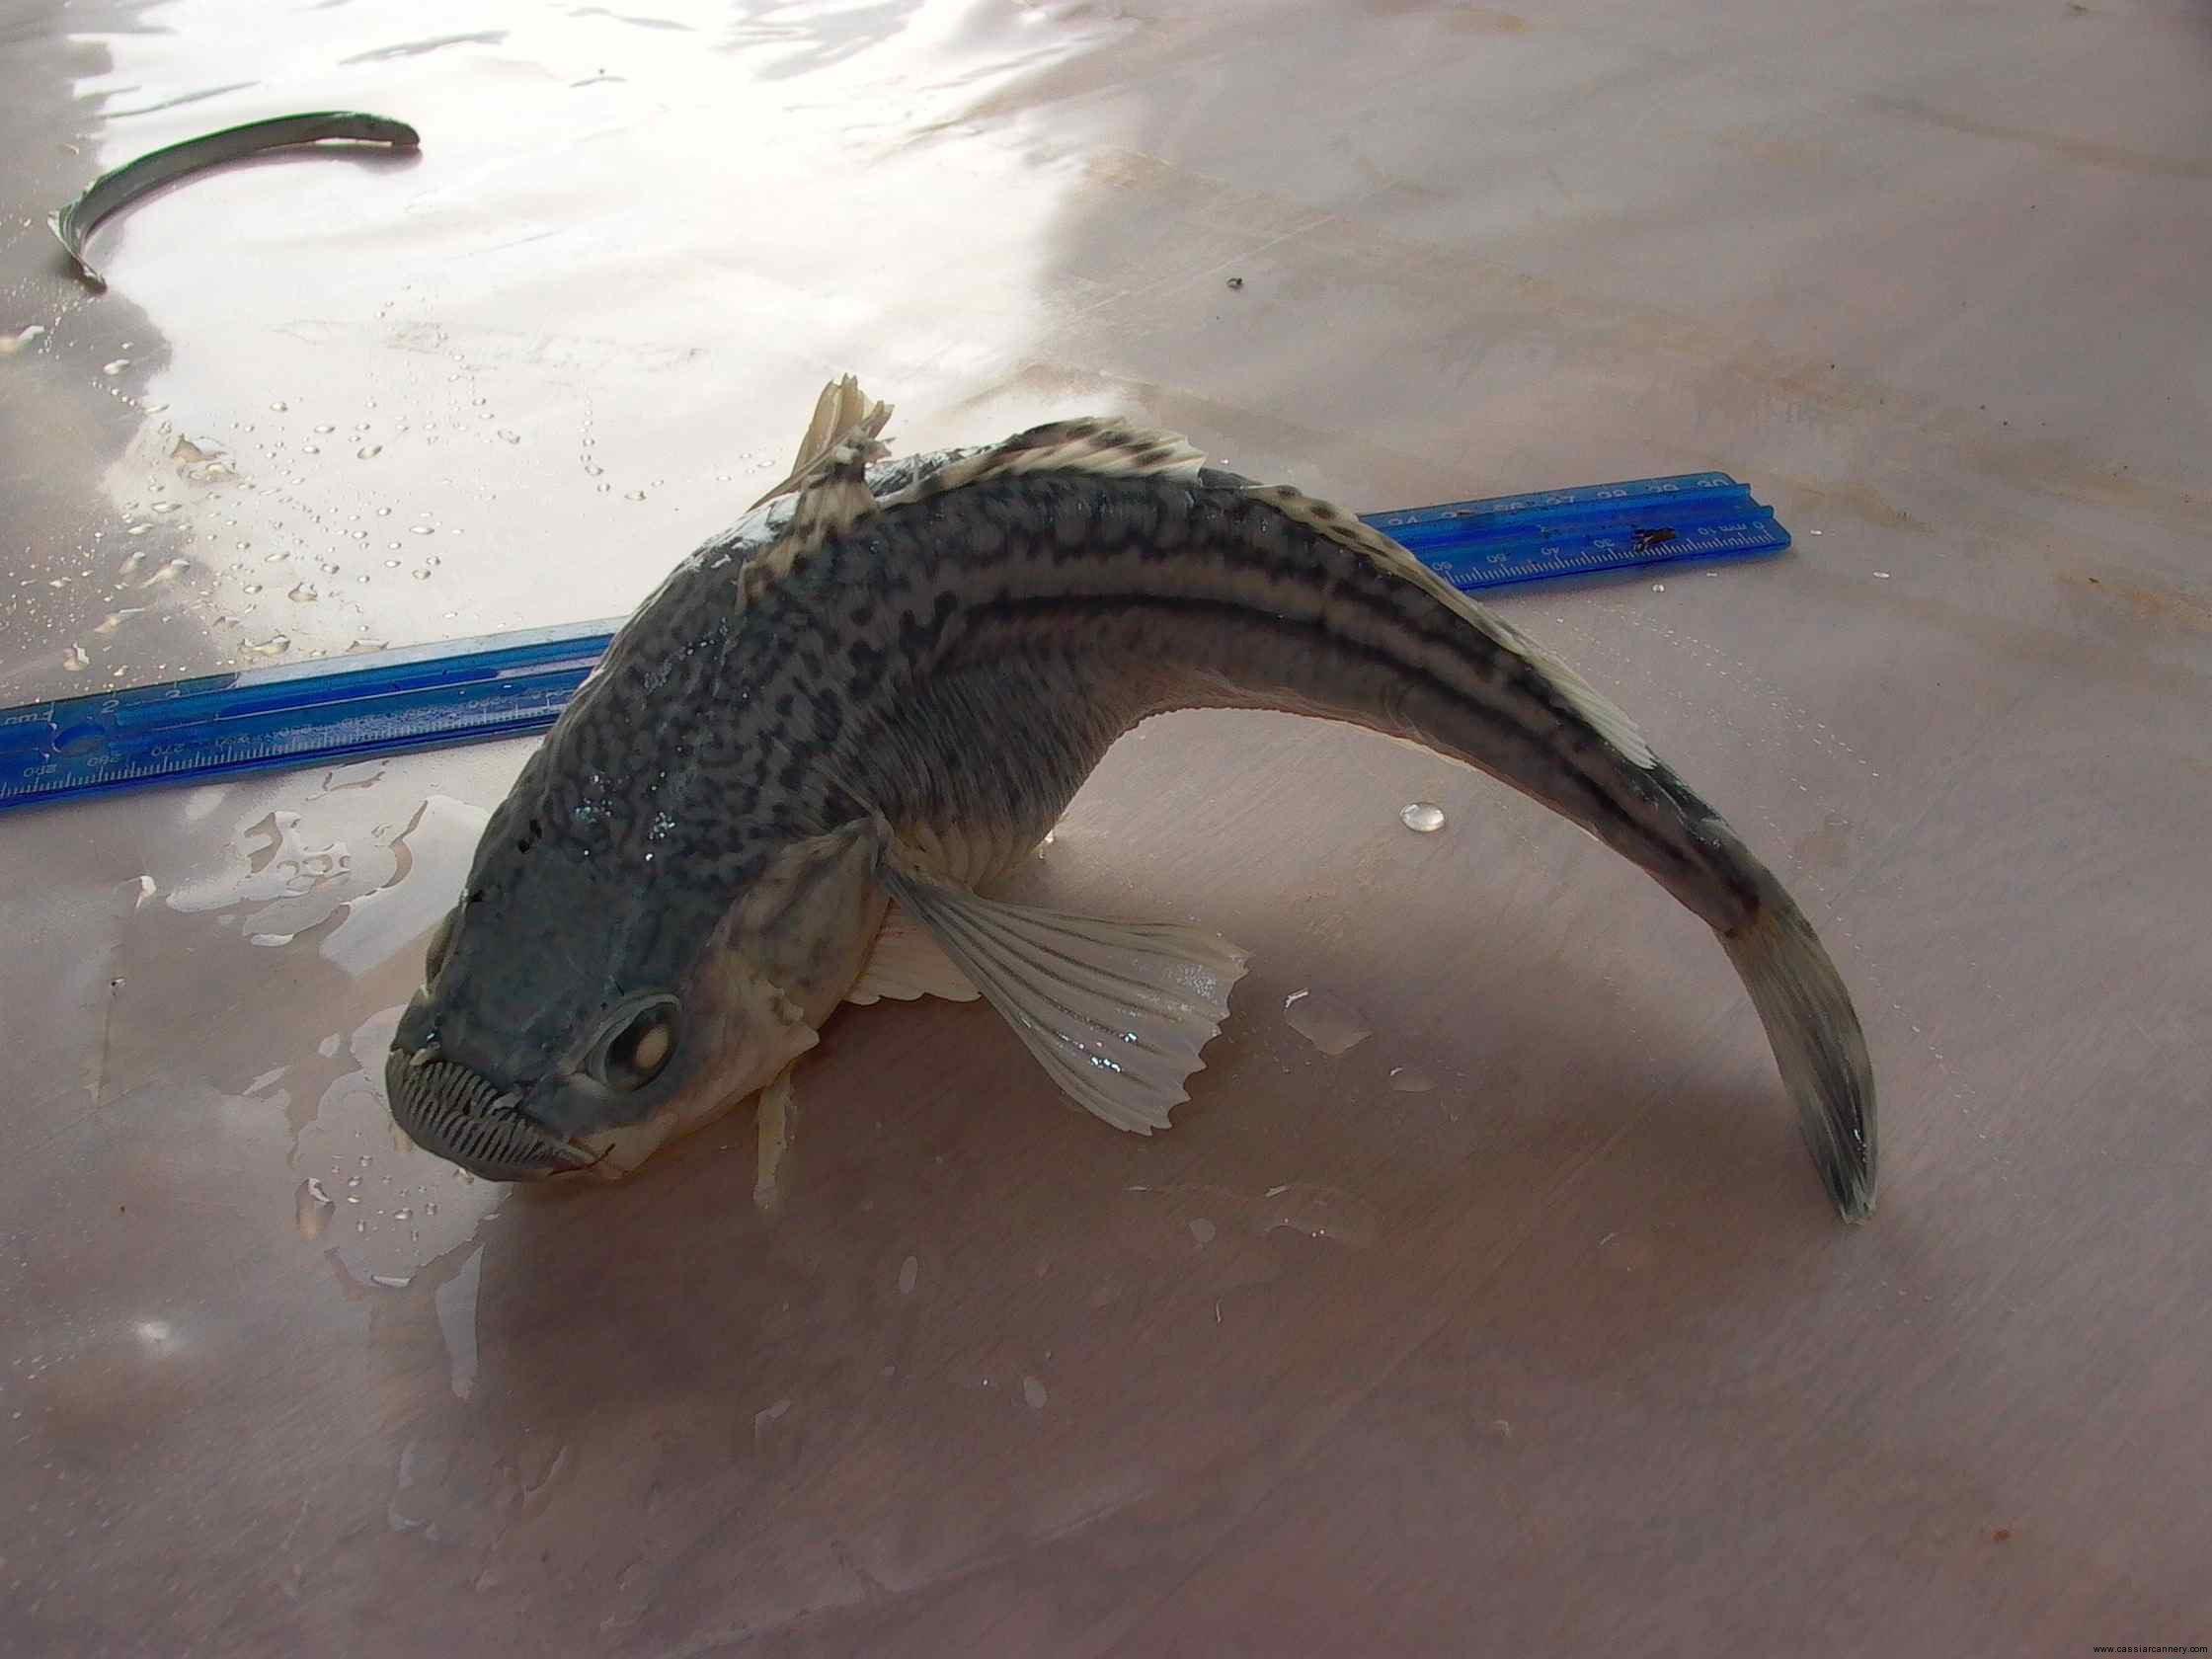 Cassiar Cannery - SERC - Marine Biology - Kelson - 2011/2012 - large sandfish 2